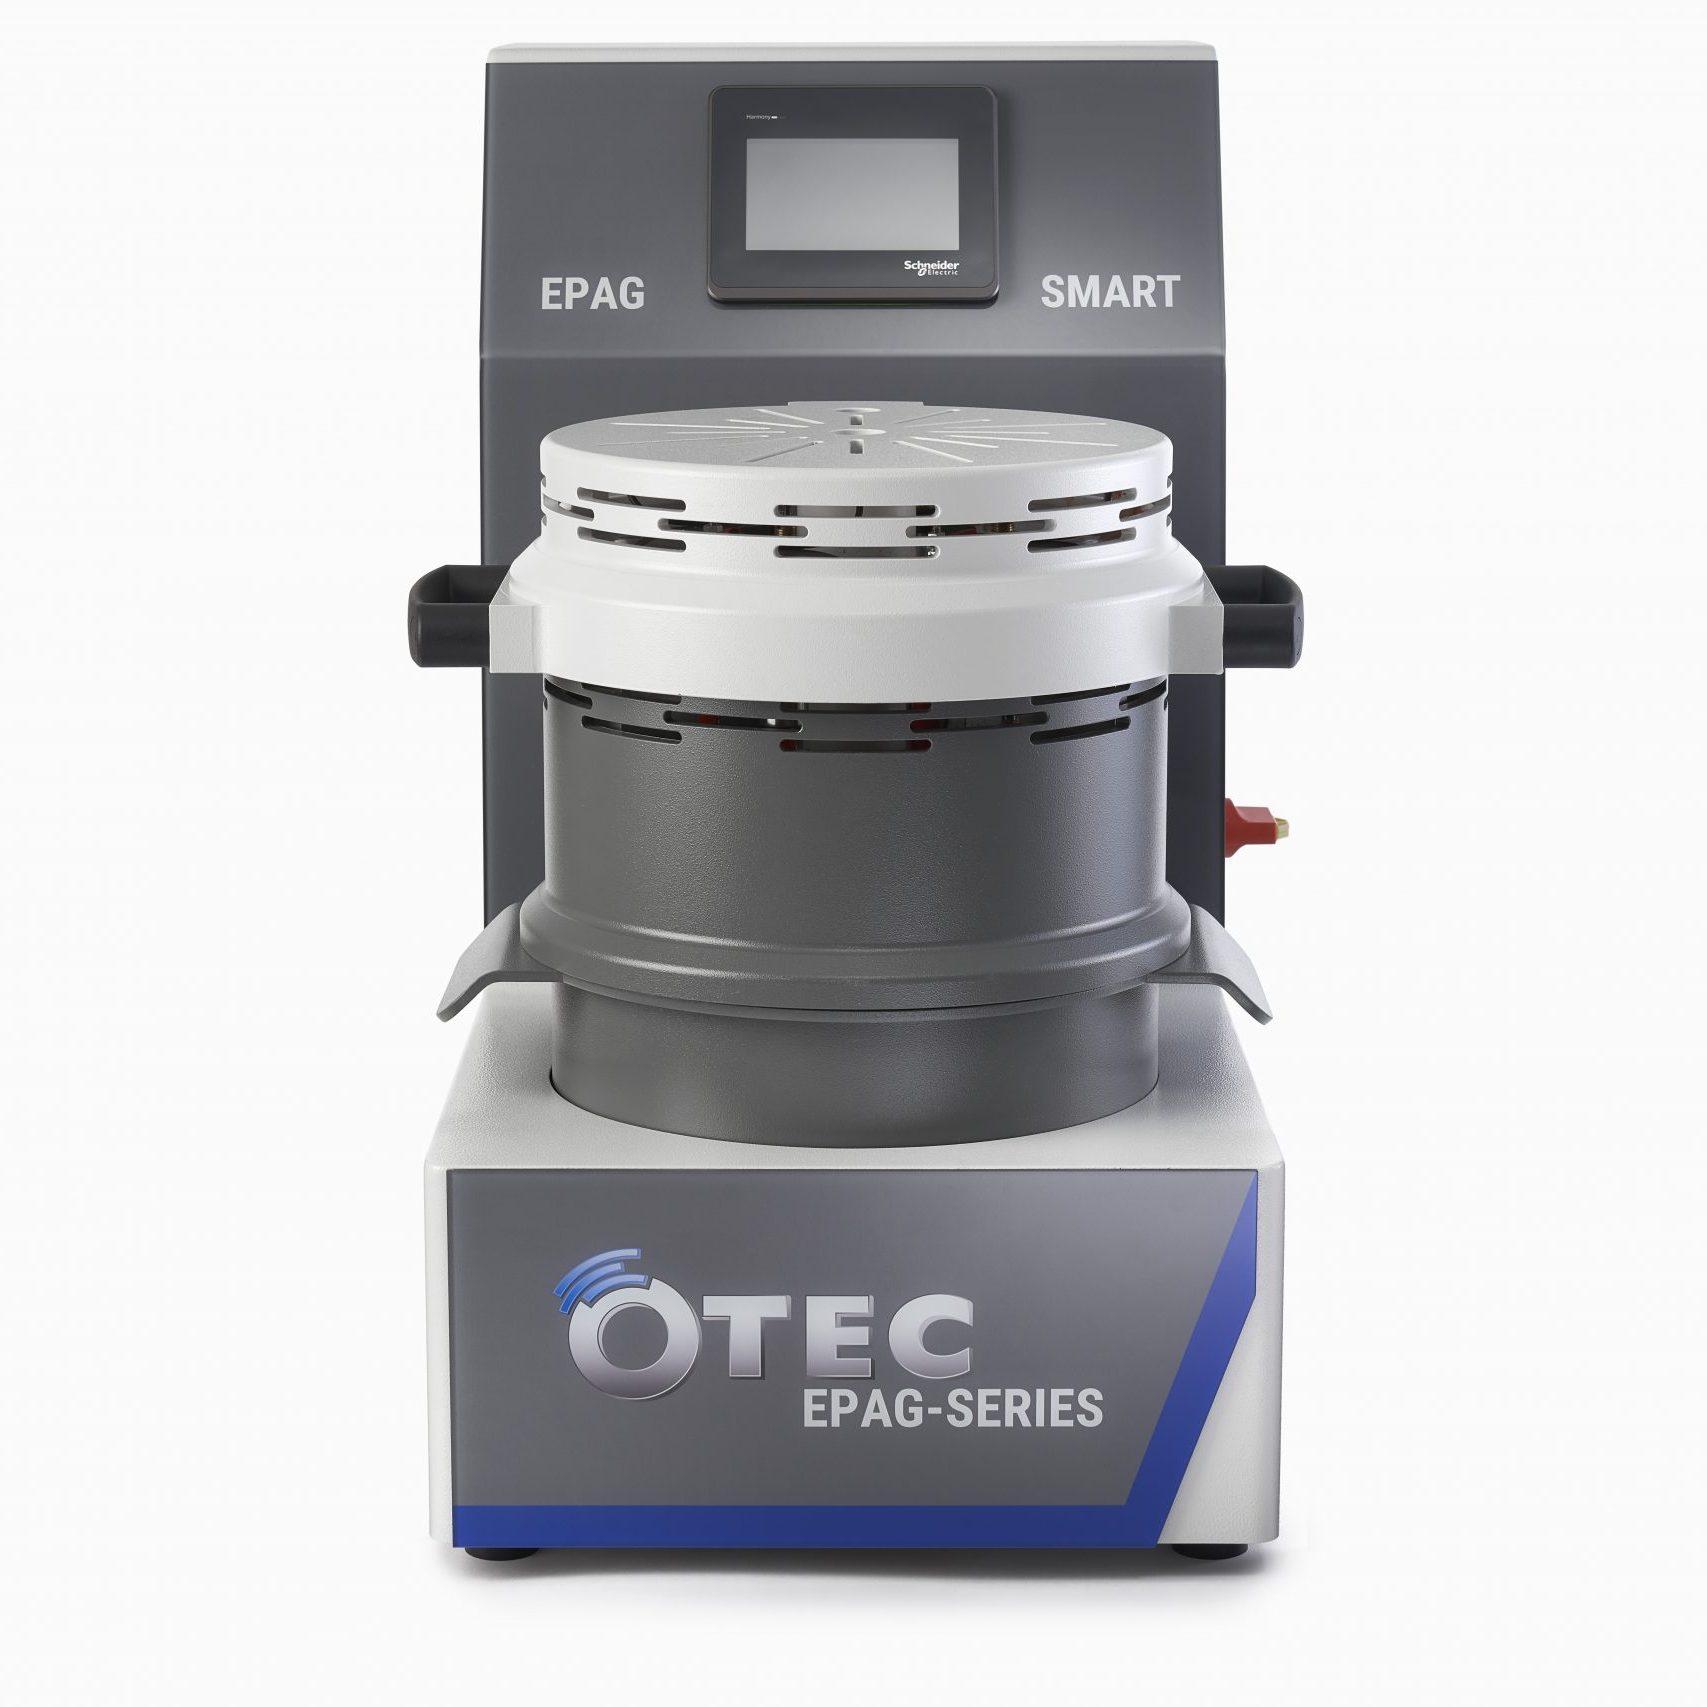 Elektropoliermaschine_EPAG-Smart_Frontal_300dpi_02